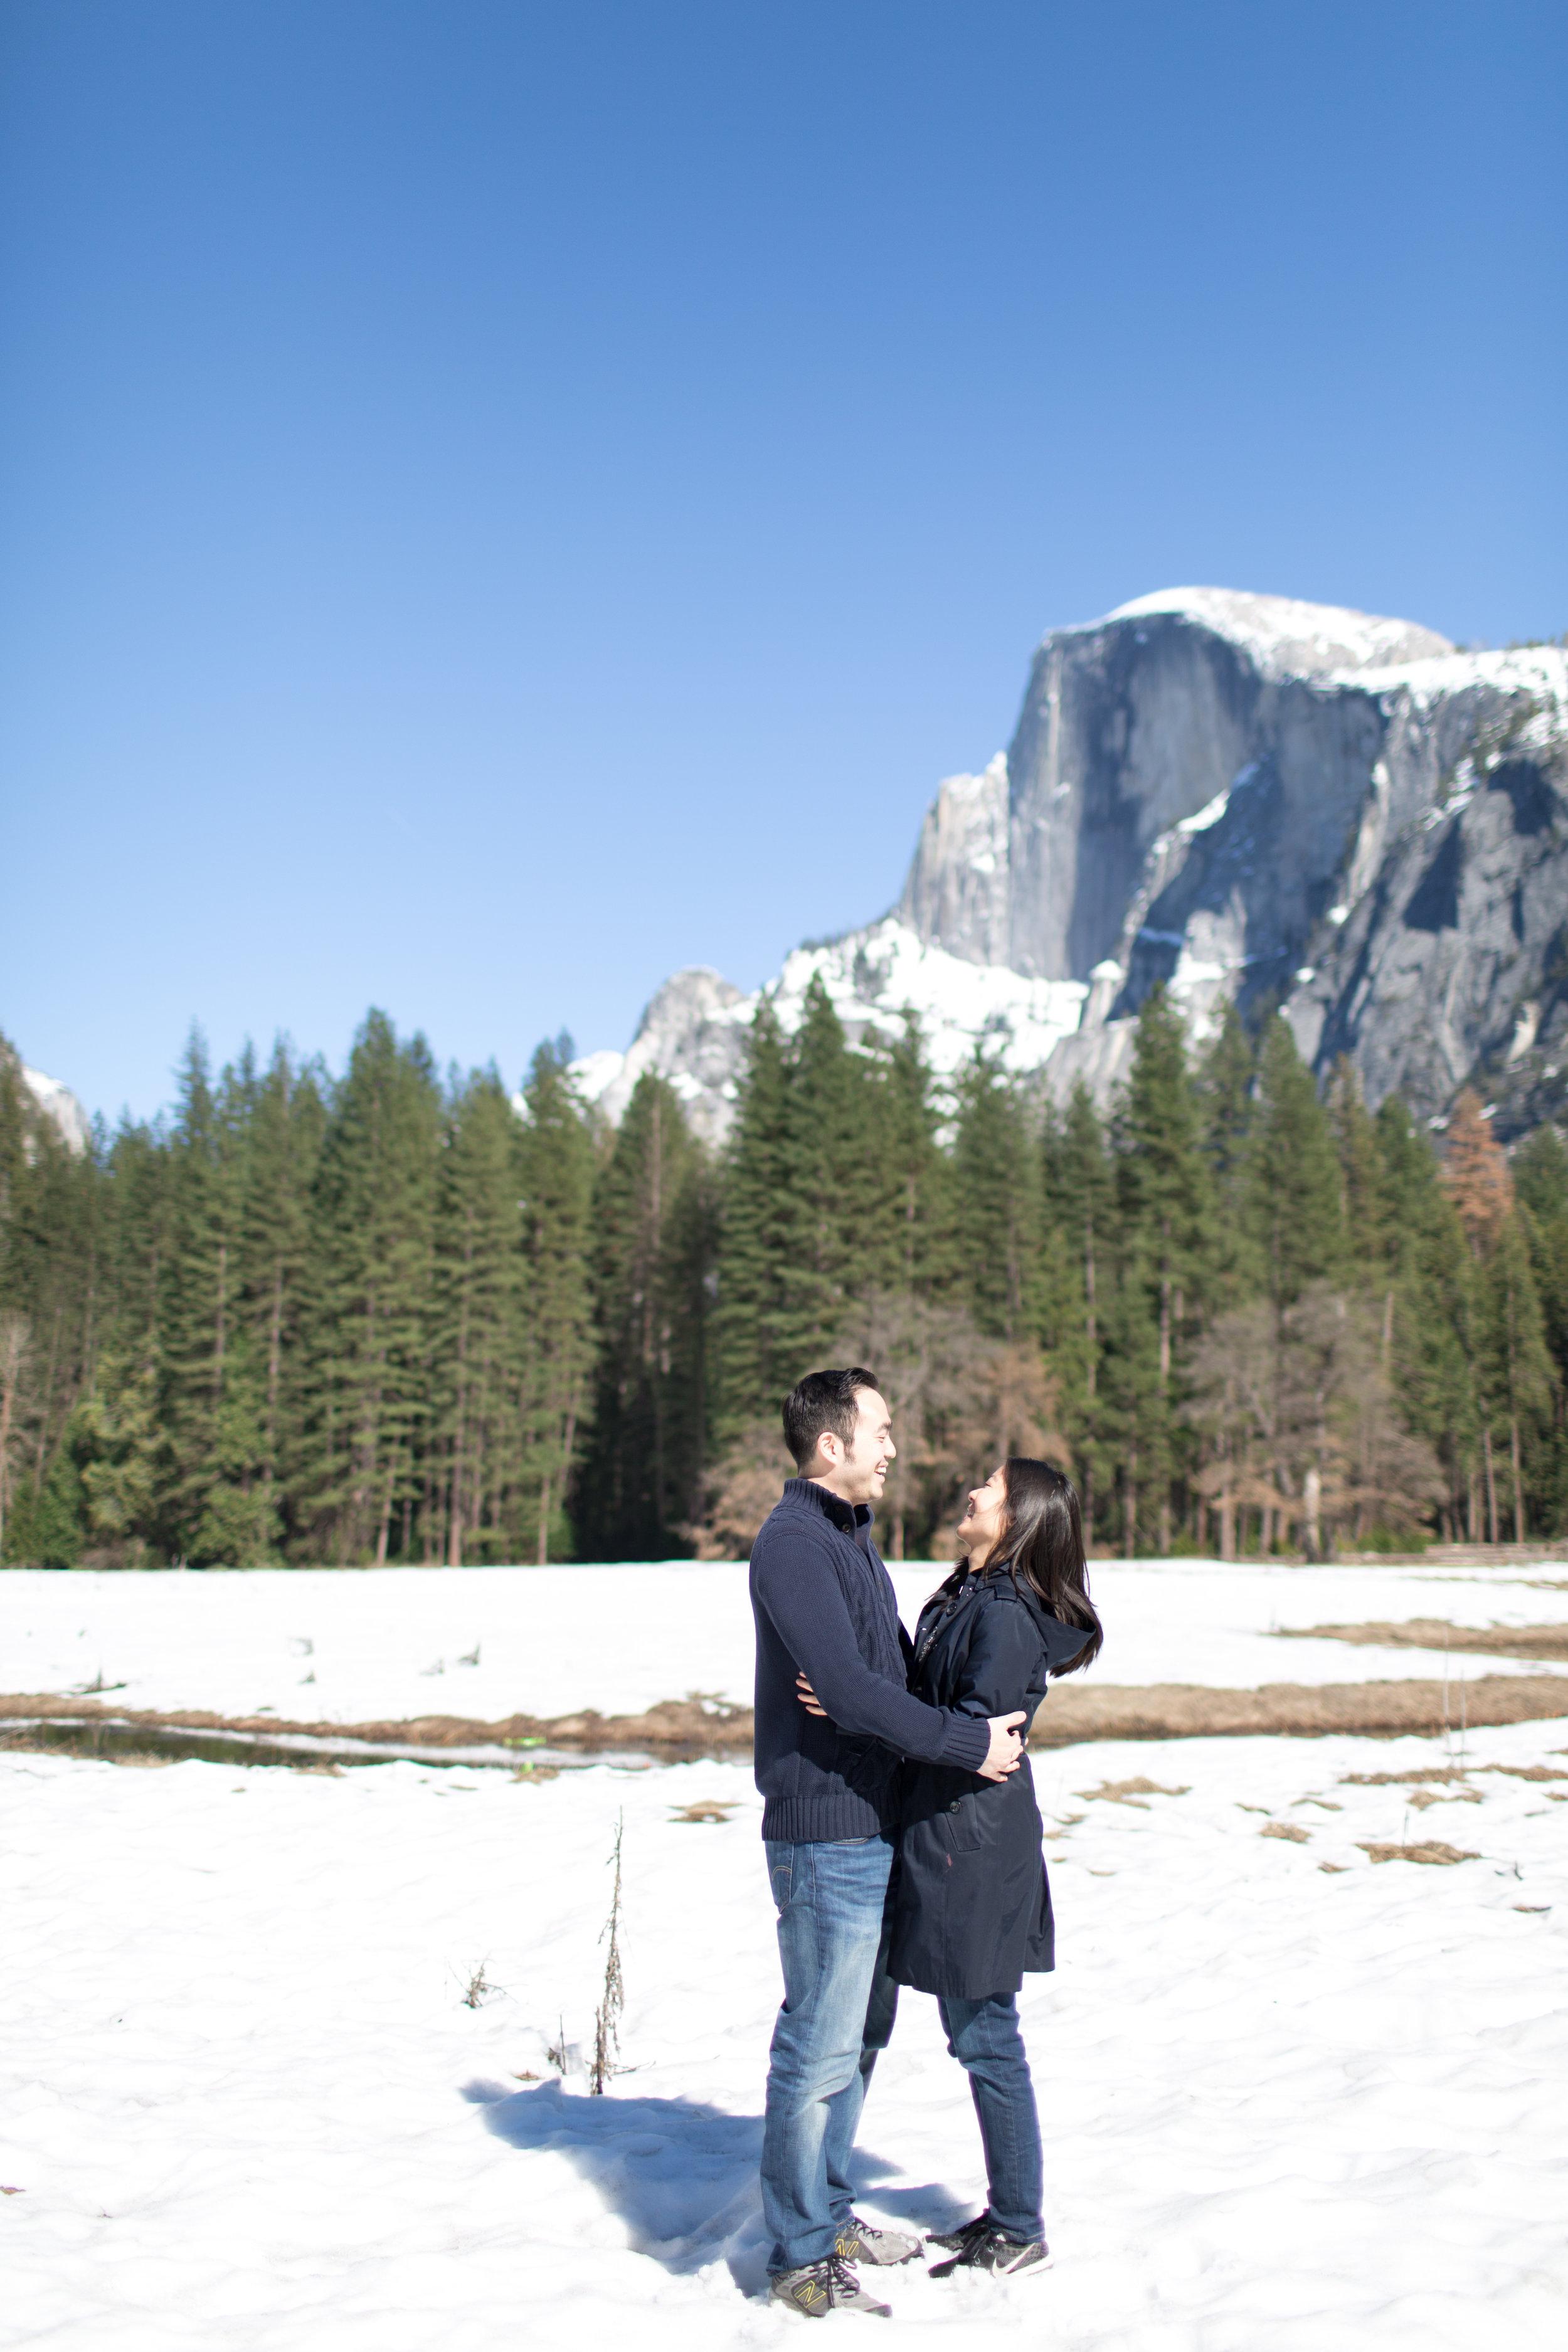 Yosemite_Day1_YosemiteValley-002.jpg